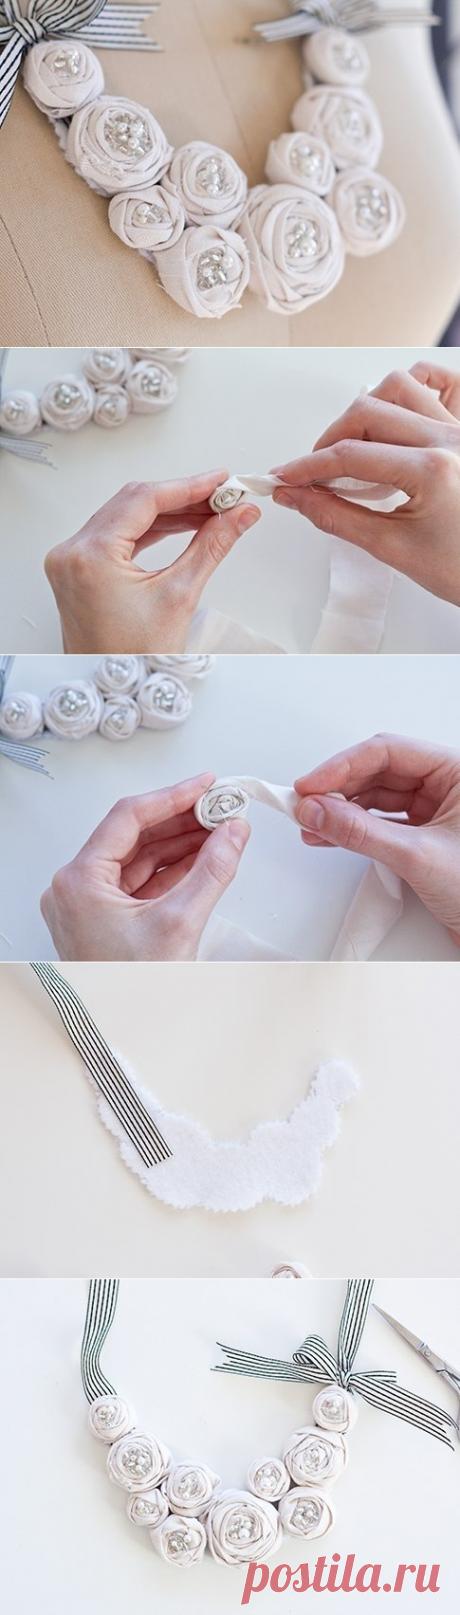 Ожерелье из роз